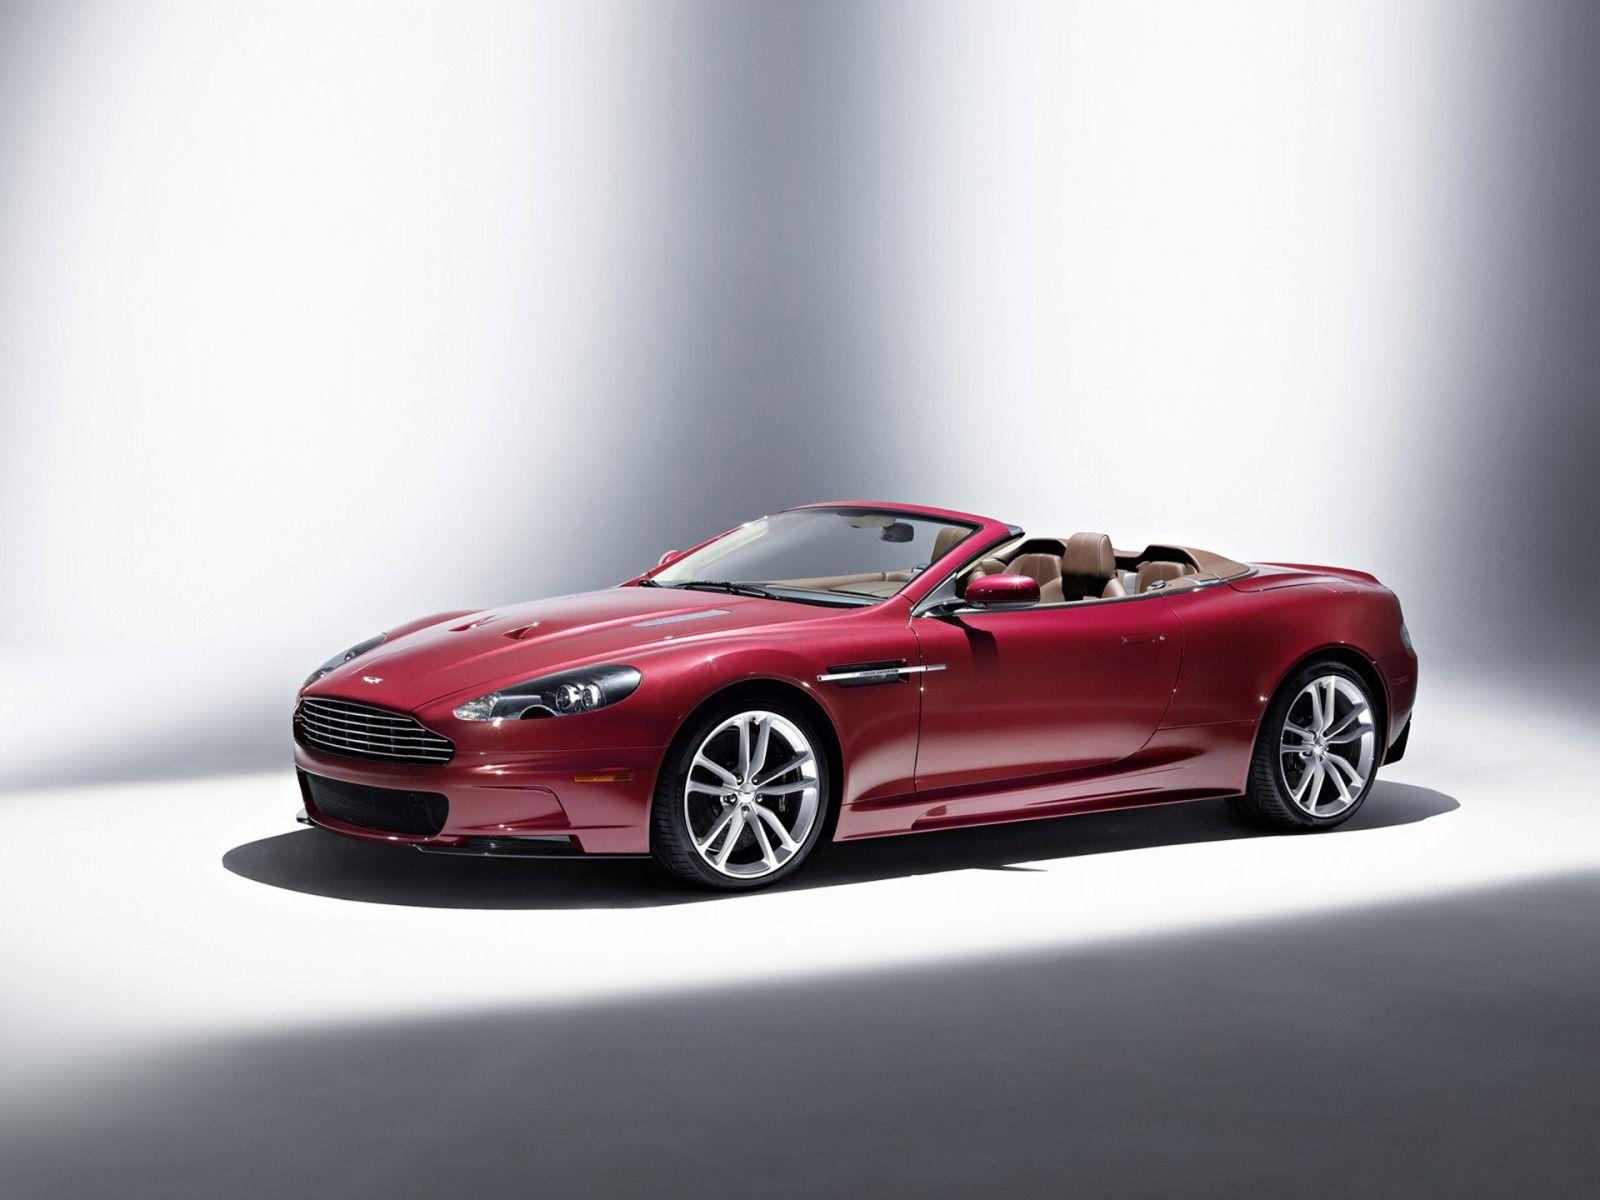 Aston Martin Vanquish Wallpapers Wallpaper 3d Wallpapers